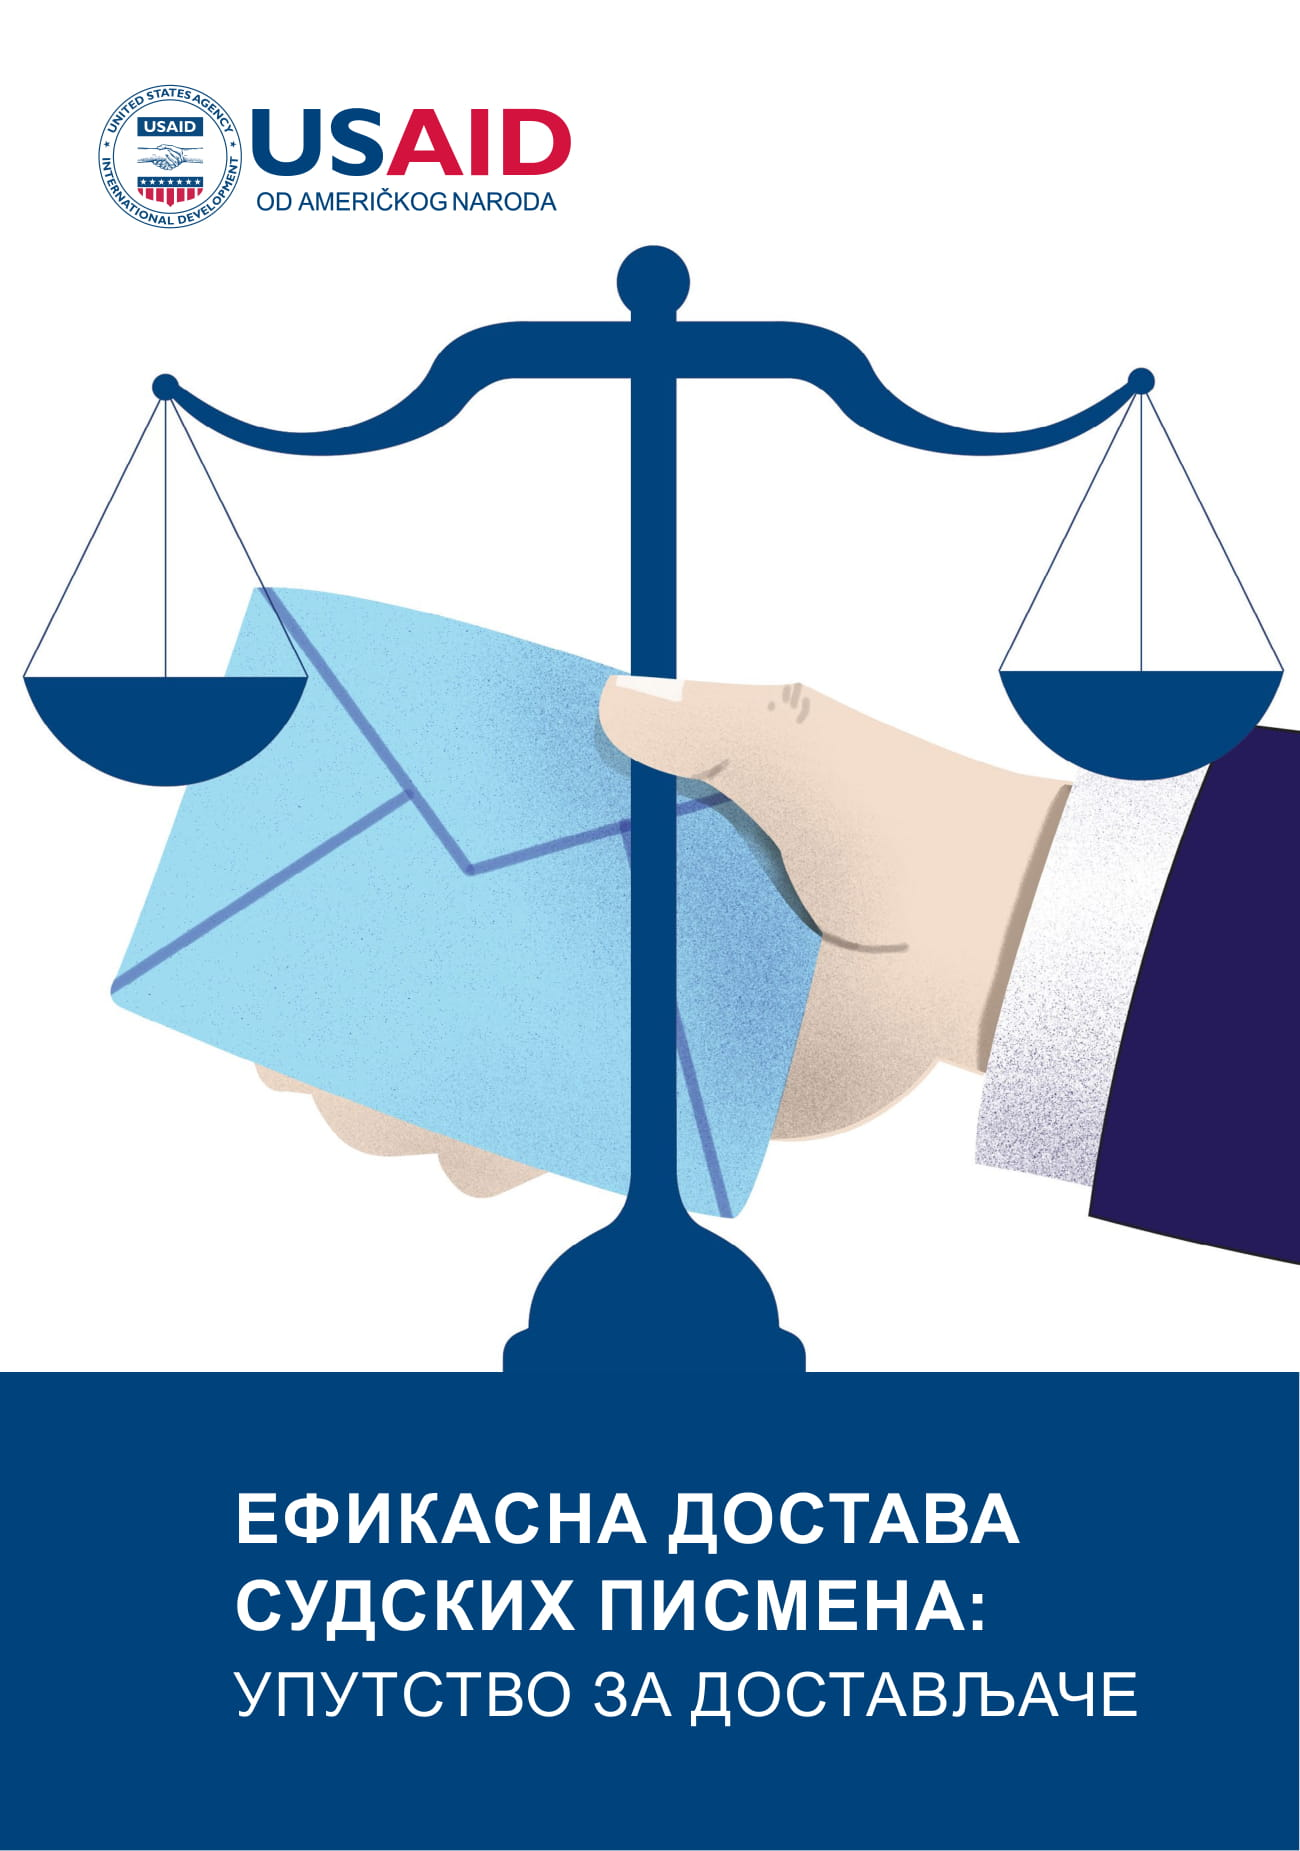 brochure-for-court-process-serversefficient-service-of-processremoved-1.jpg